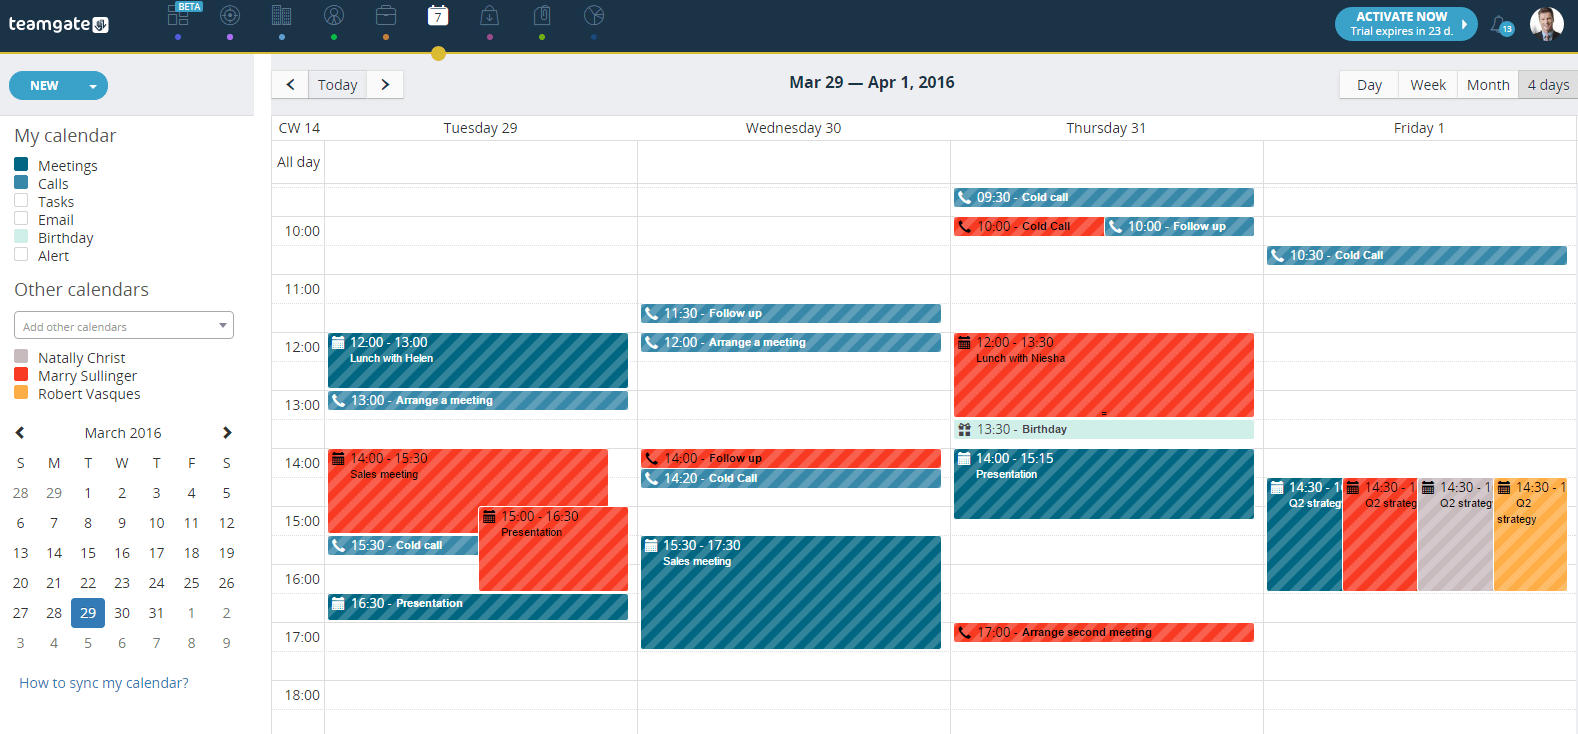 Calendar Advisor